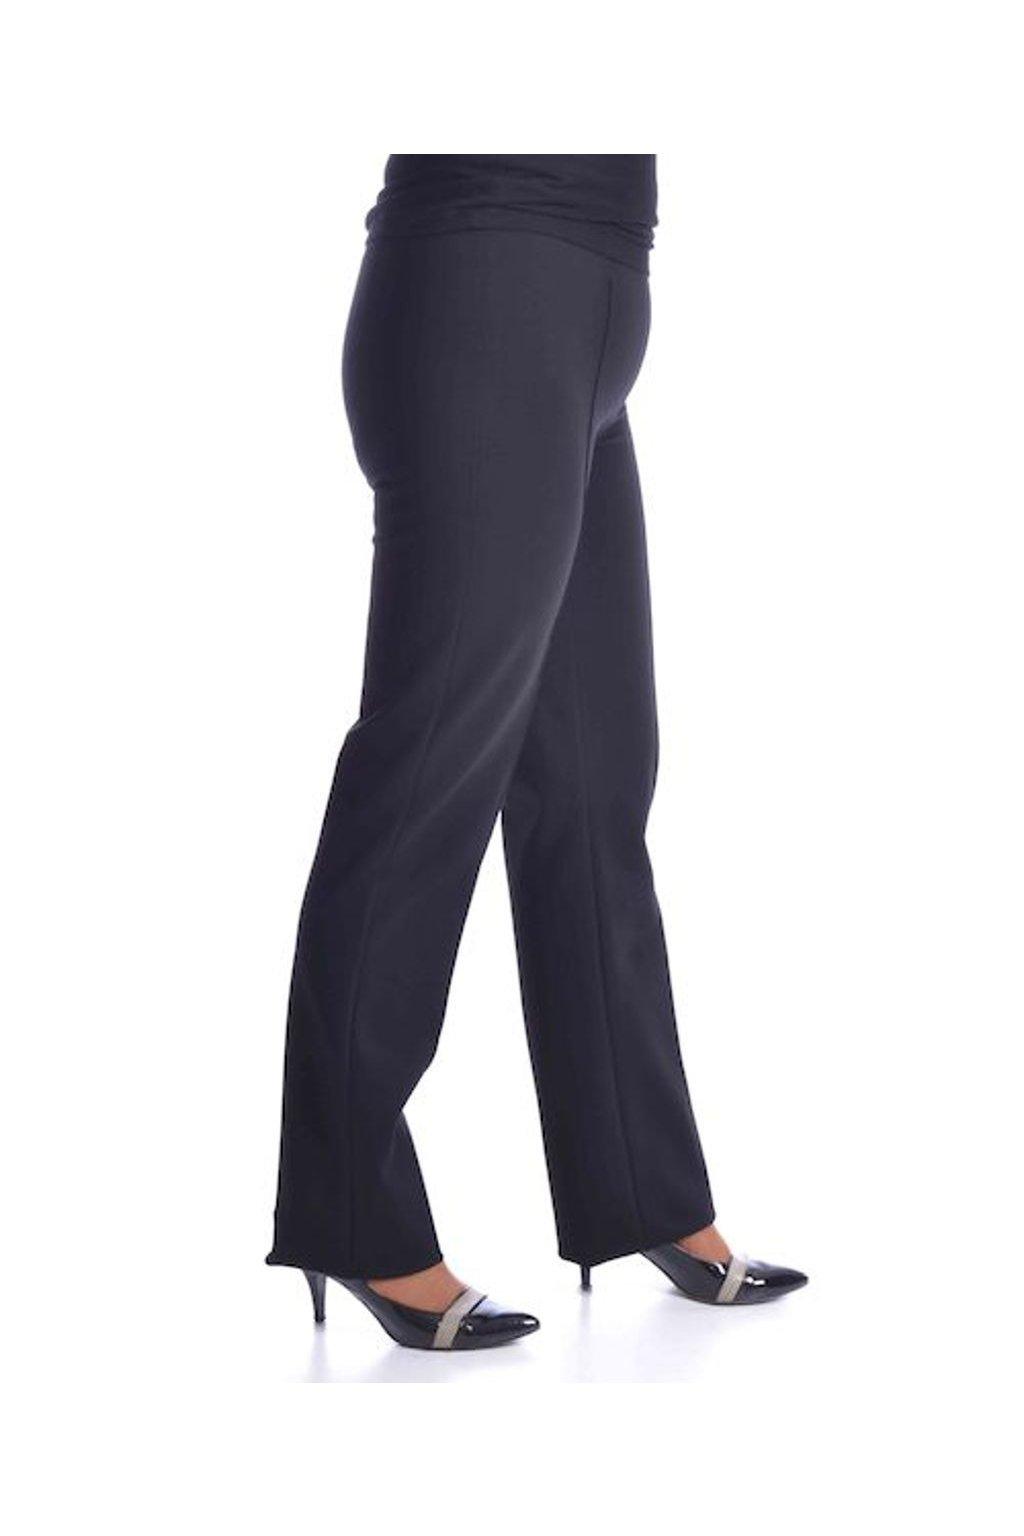 36T Kalhoty Igor (Velikost 36, Barva Černá)